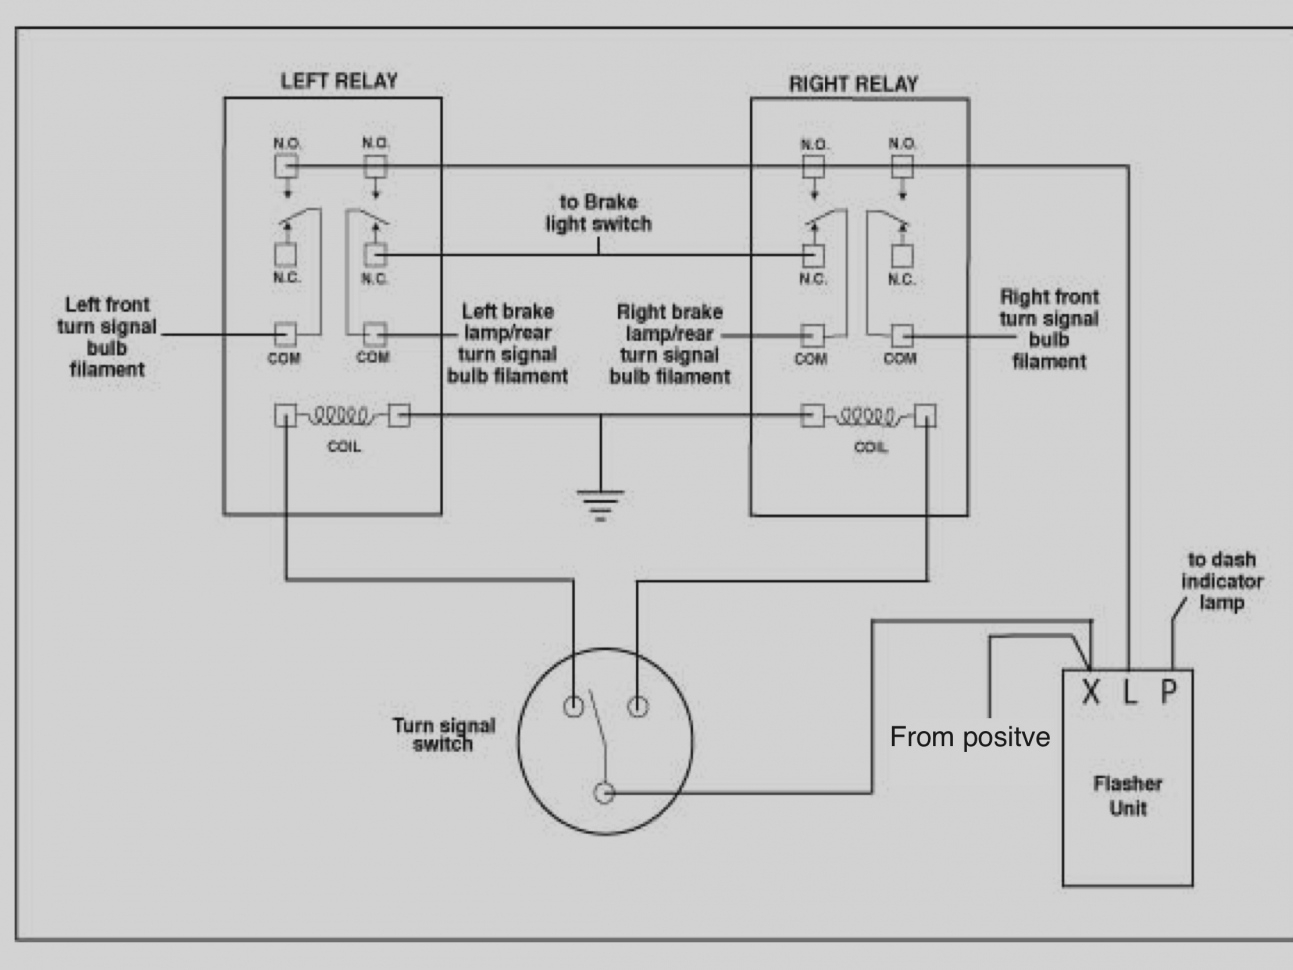 wiring diagram for polaris ranger crew group electrical 2012 polaris rzr 800 wiring diagram polaris rzr 900 wiring diagram group